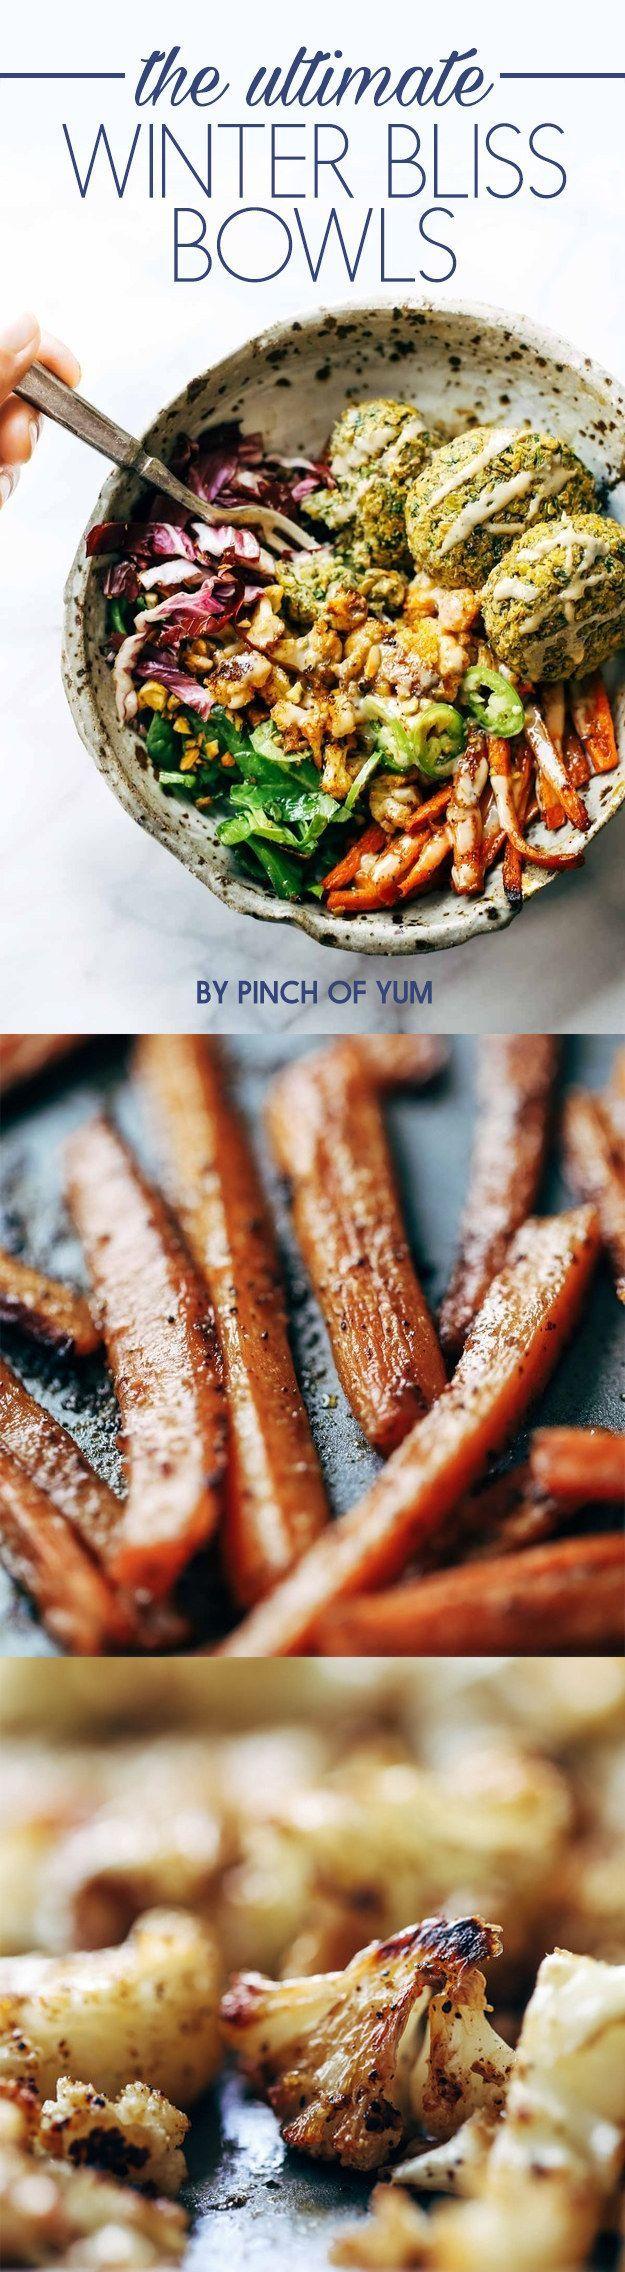 Recipe // Carrots + Cauliflower + Jalapeno + Red Cabbage + Spinach + Tahini + Salt + Pepper + Olive Oil + Cumin + Pistachios + Falafel